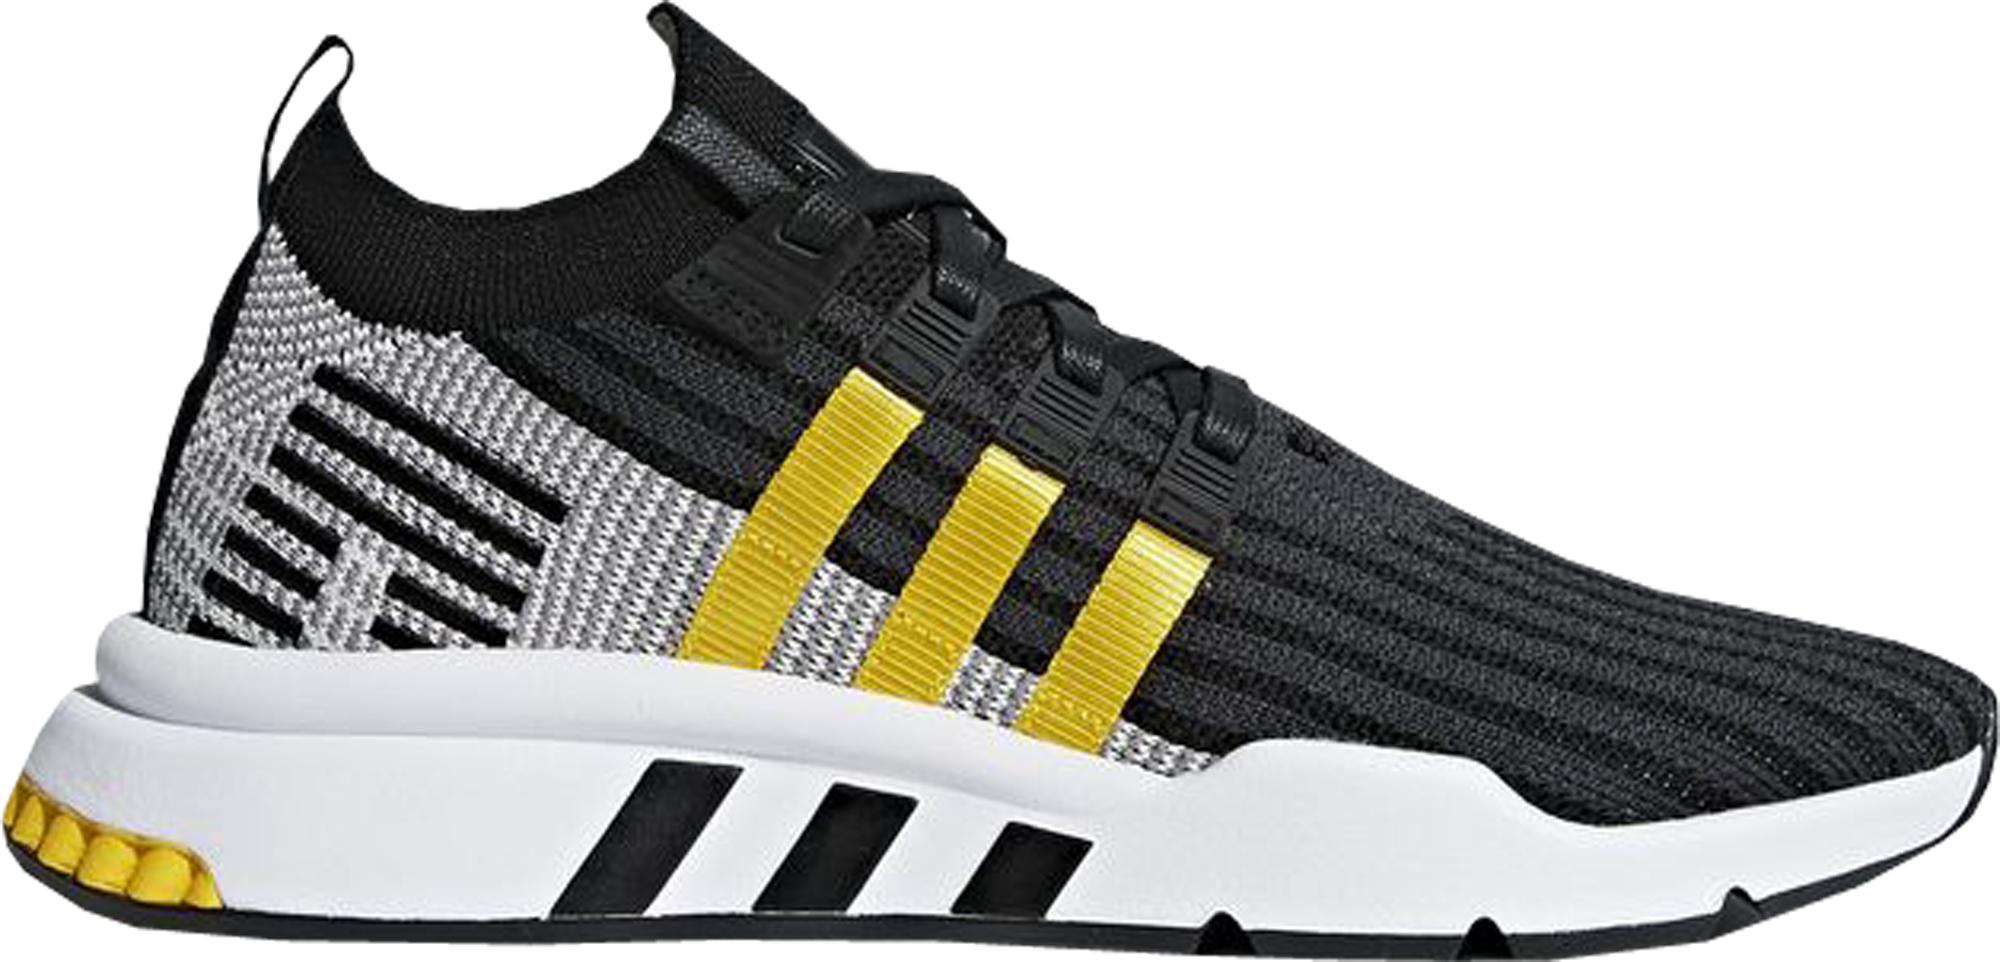 adidas EQT Support Mid Adv Black Equipment Yellow